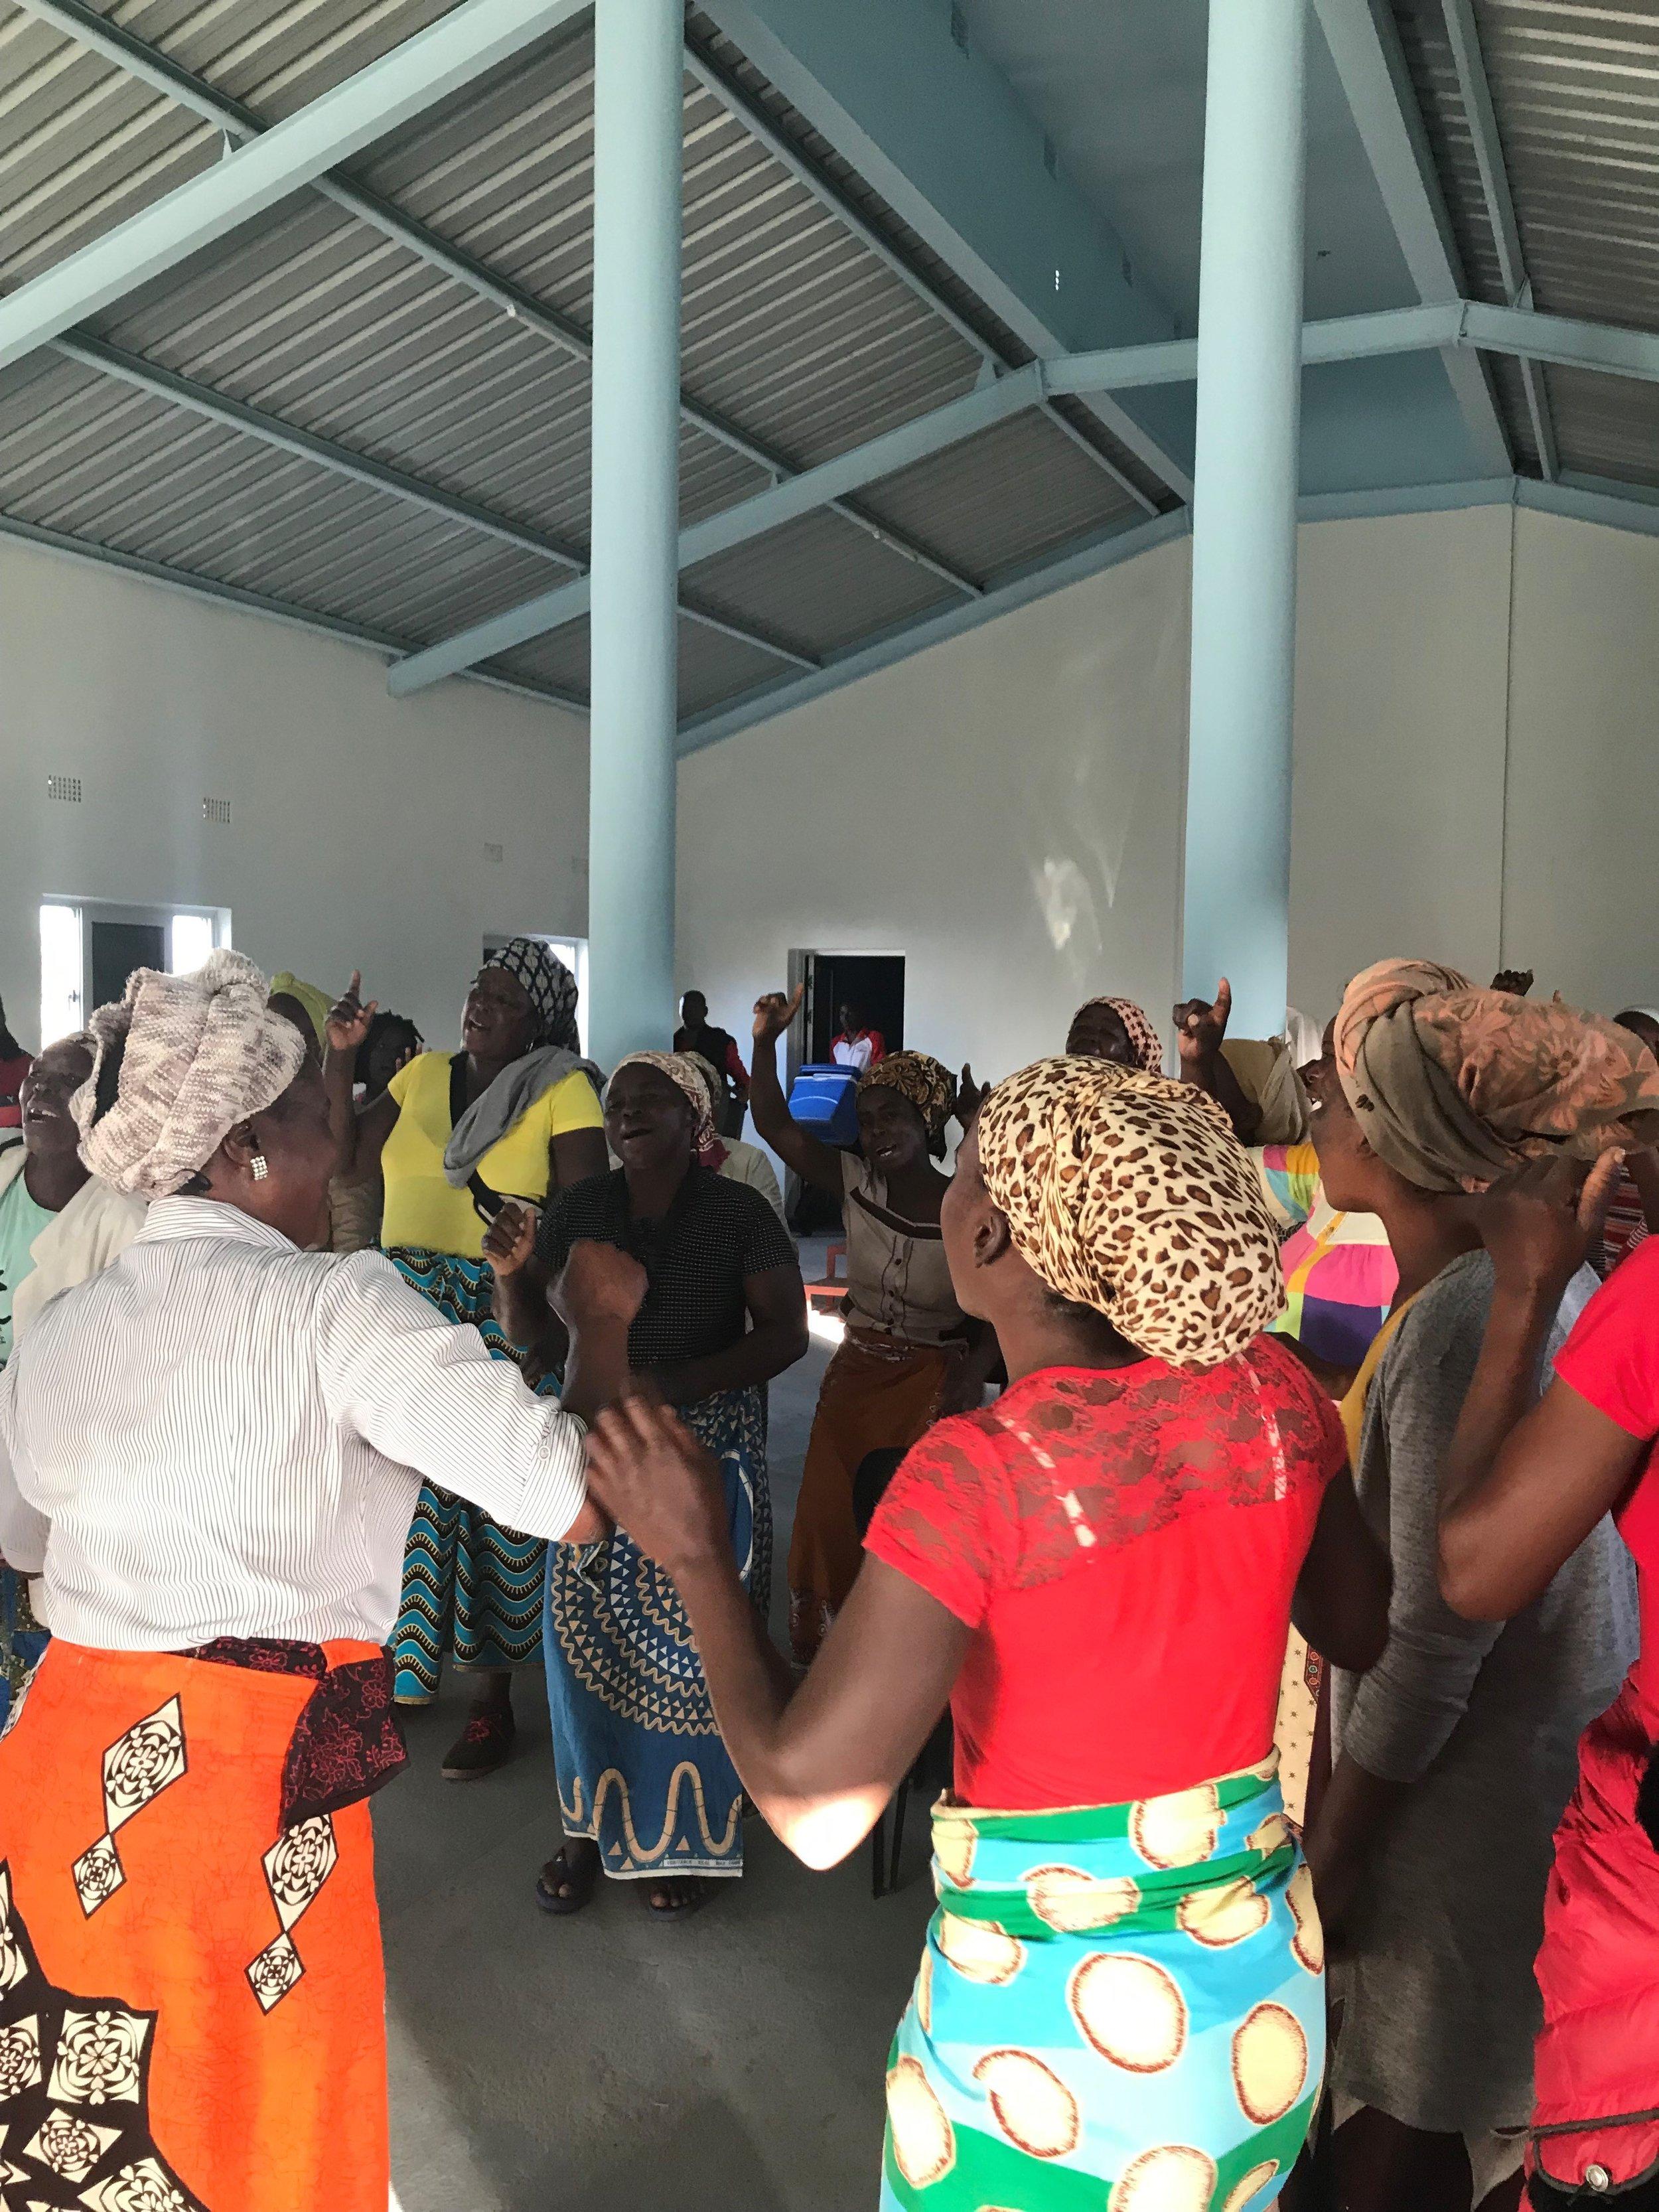 WOW Moz Macalawane Church 1 20190813.jpg